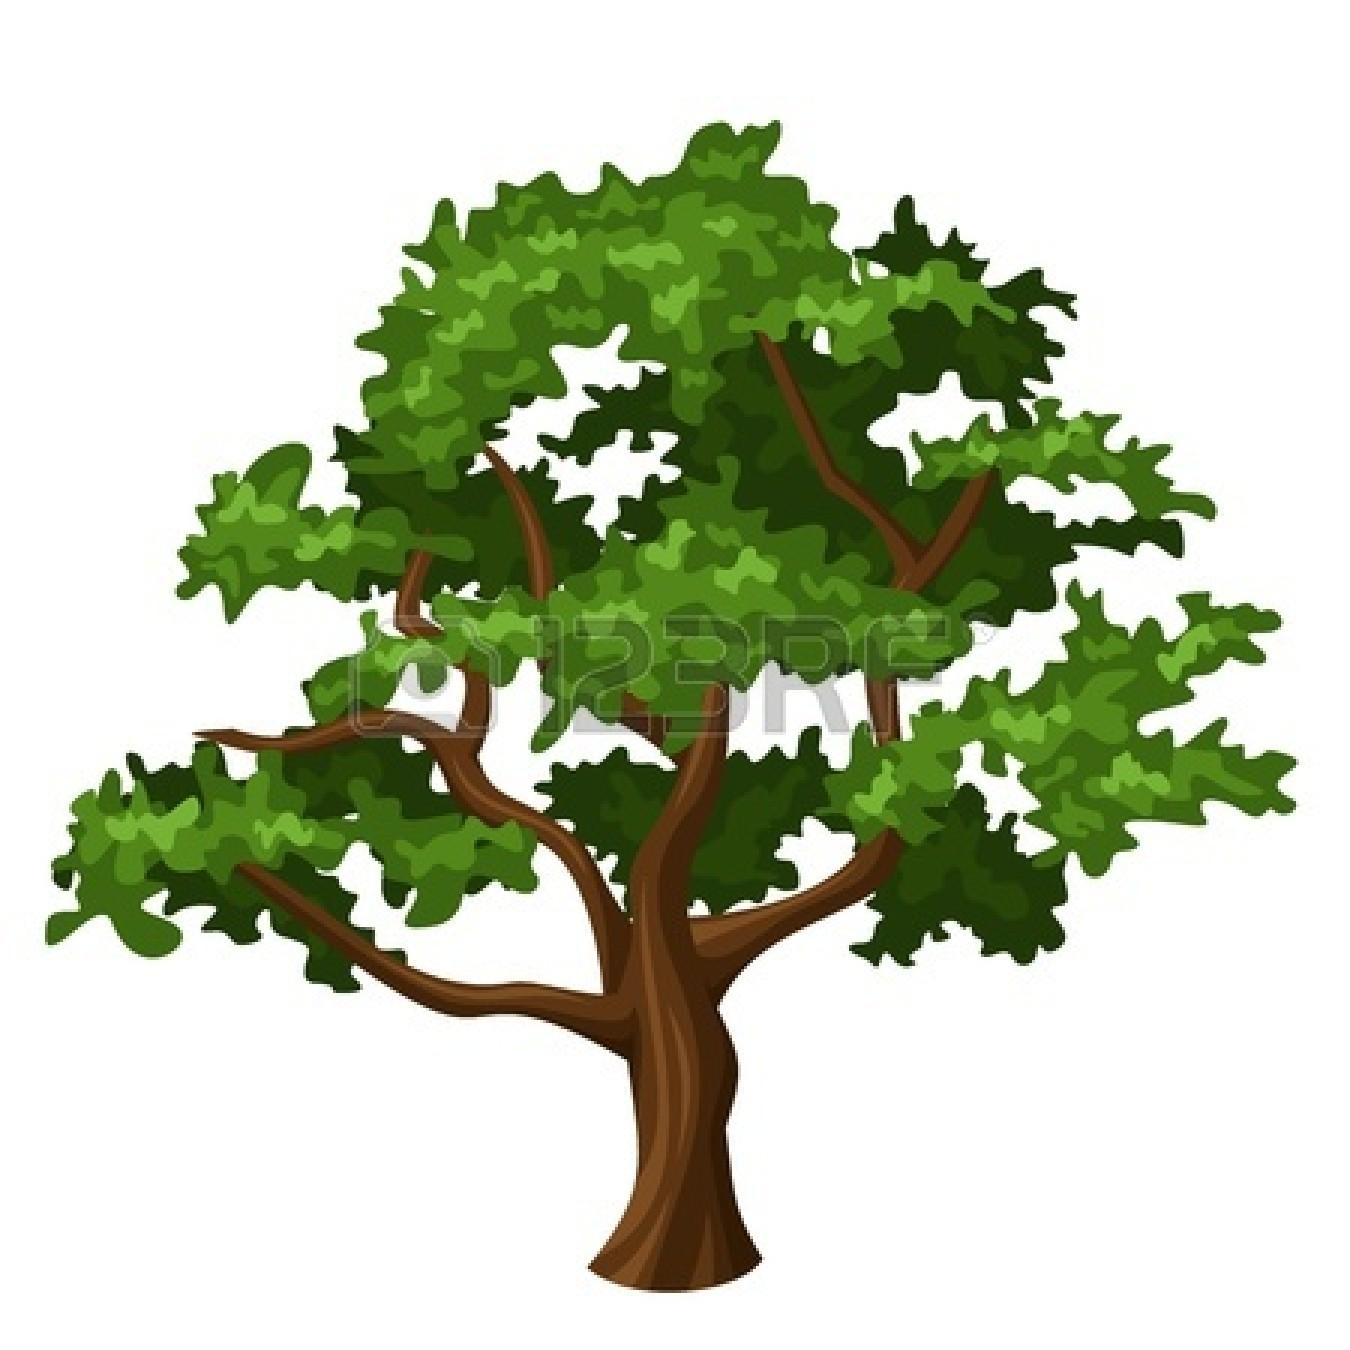 White oak clipart png transparent Free Oak Tree Clipart, Download Free Clip Art, Free Clip Art on ... png transparent